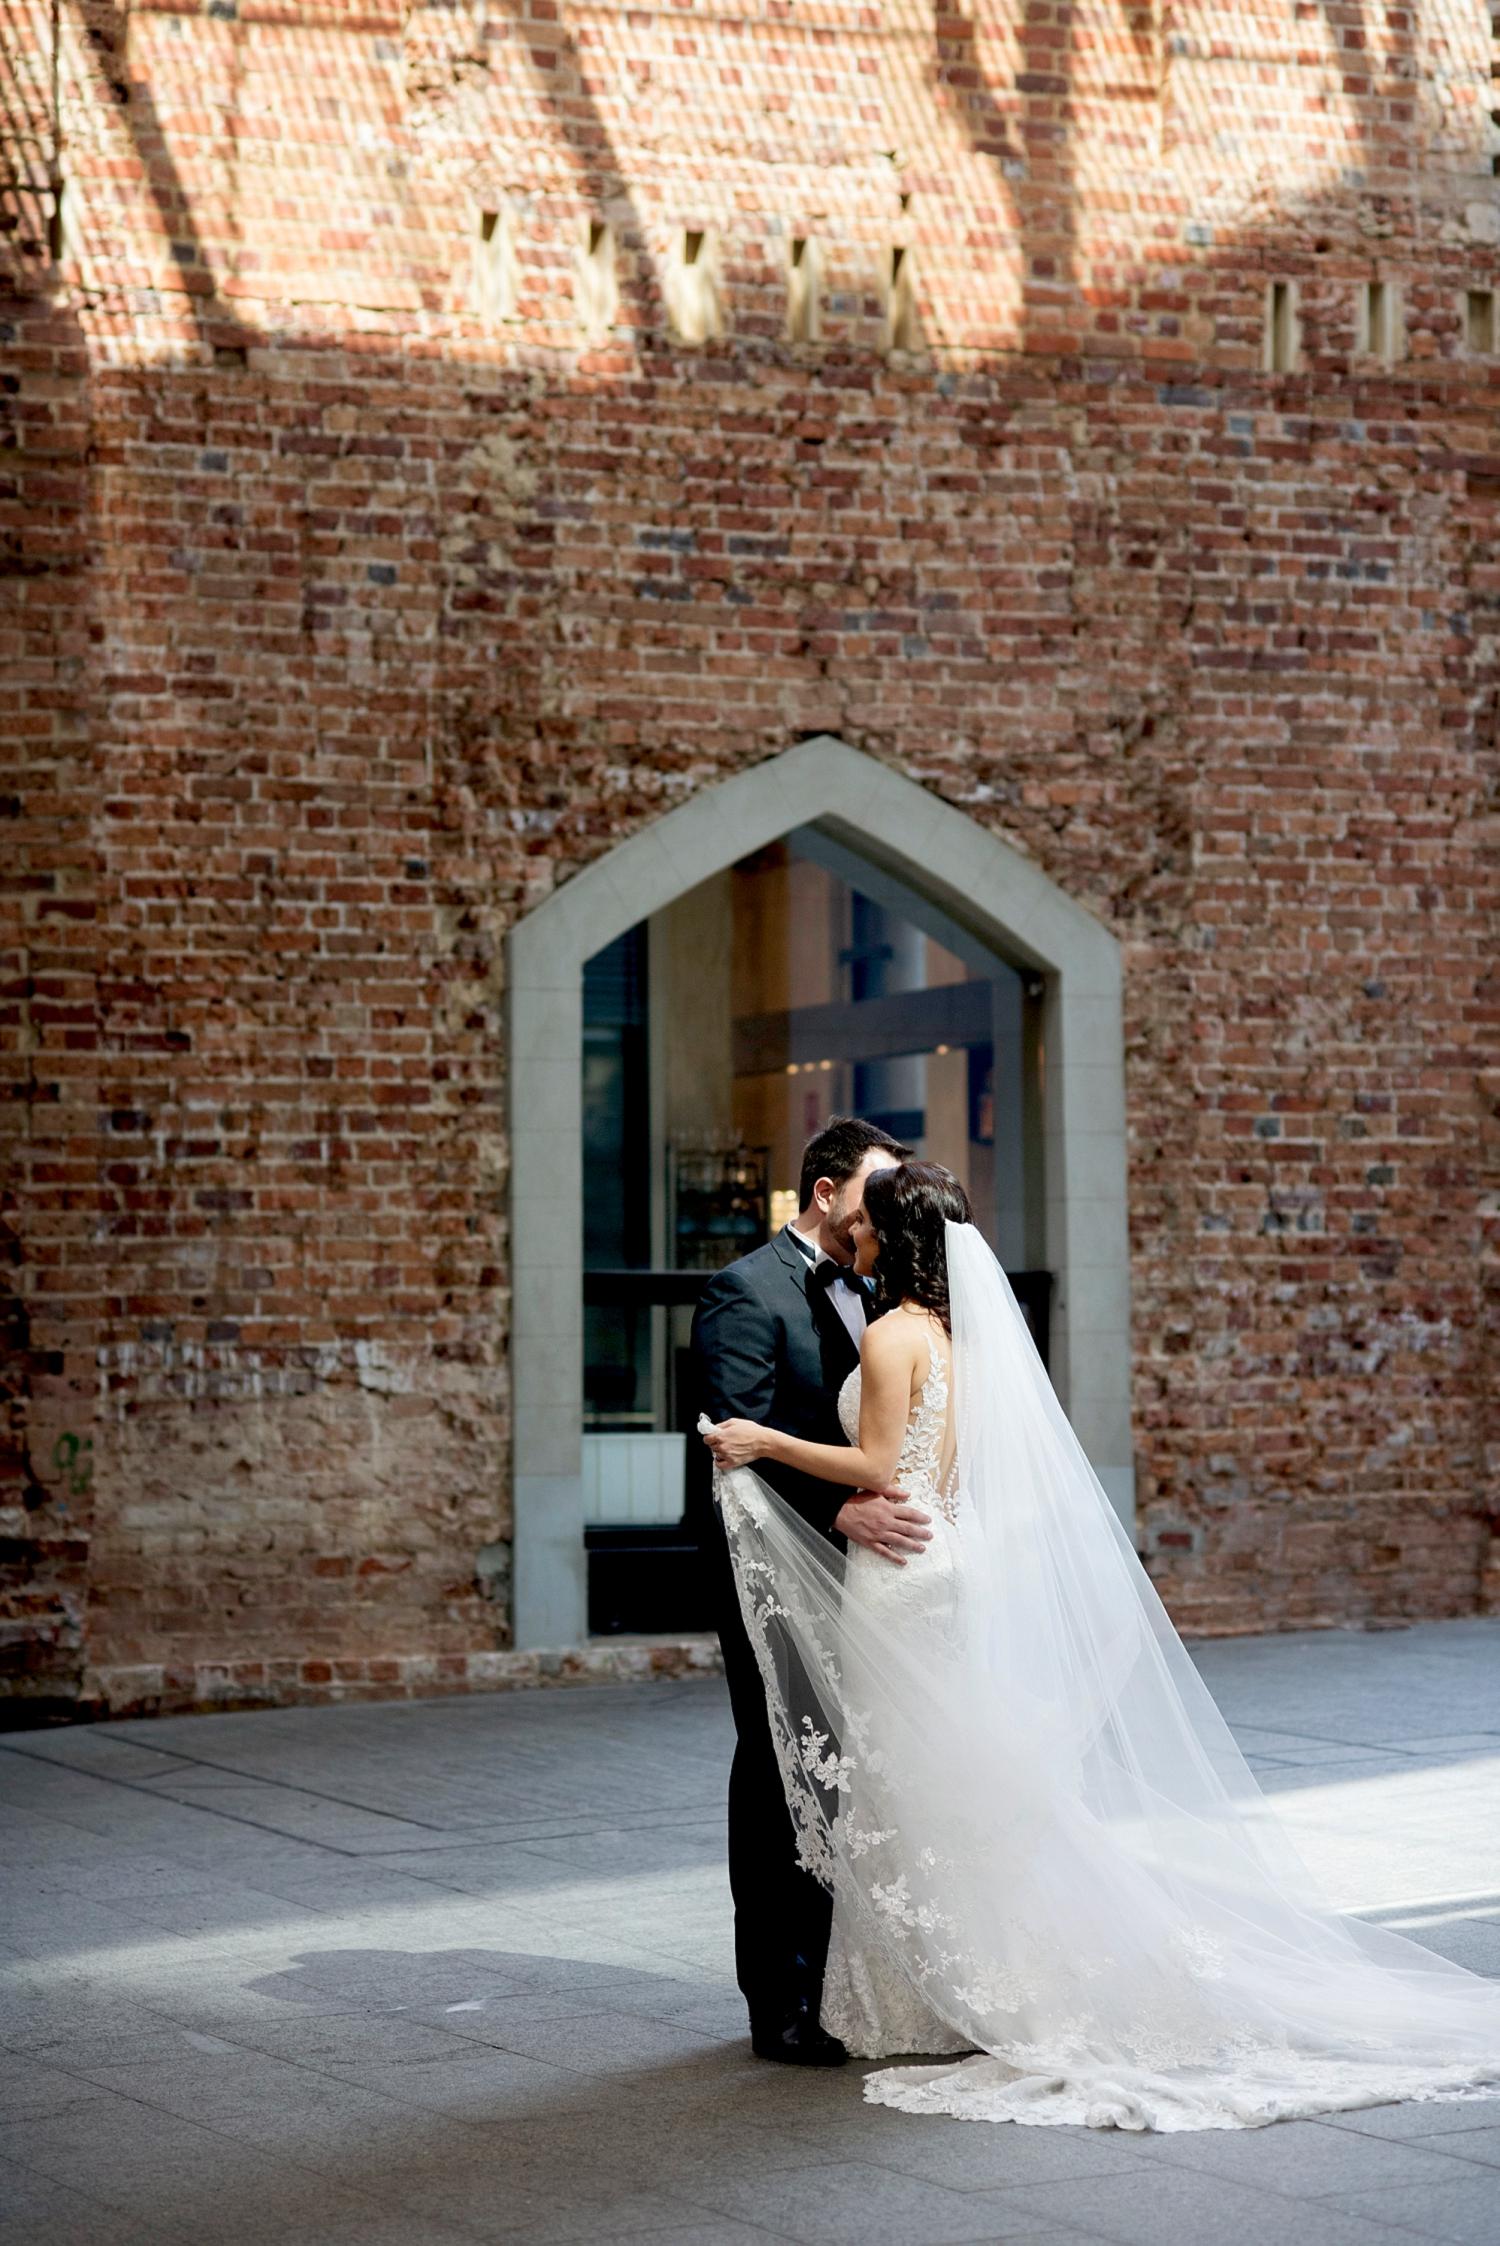 40_treasury buildings wedding photos perth.jpg